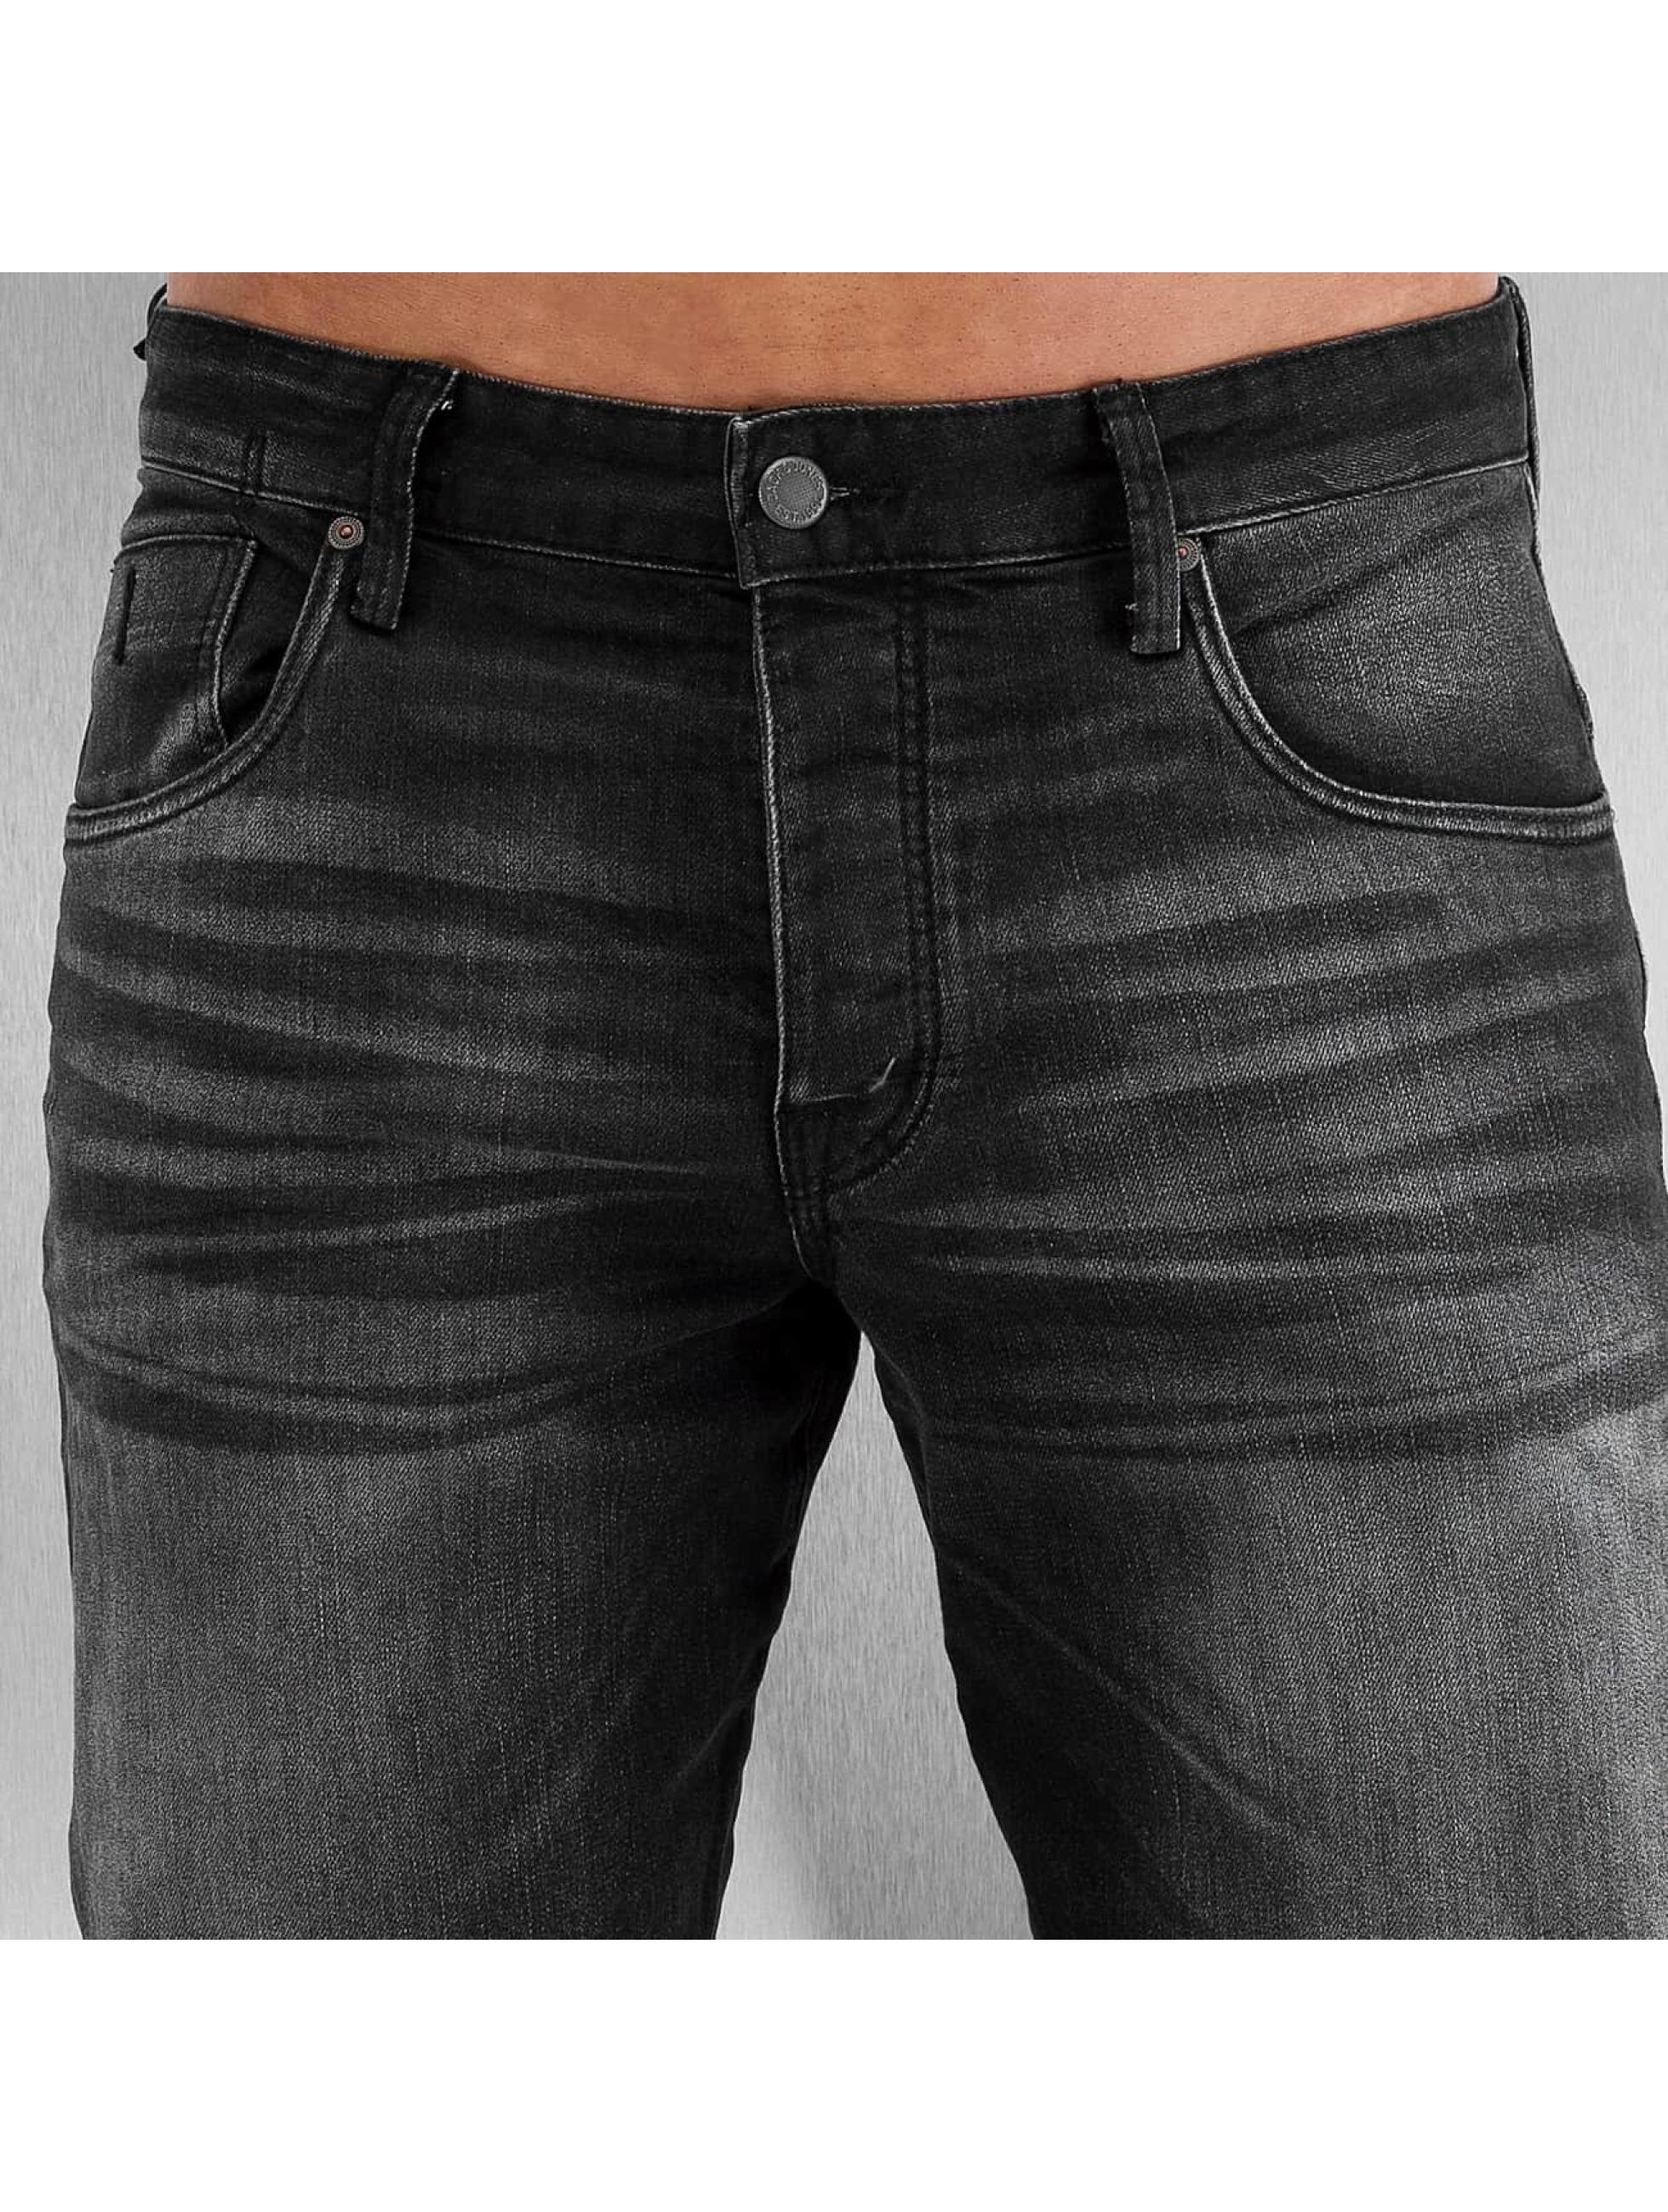 Jack & Jones Straight Fit Jeans jjiMike jjIron black